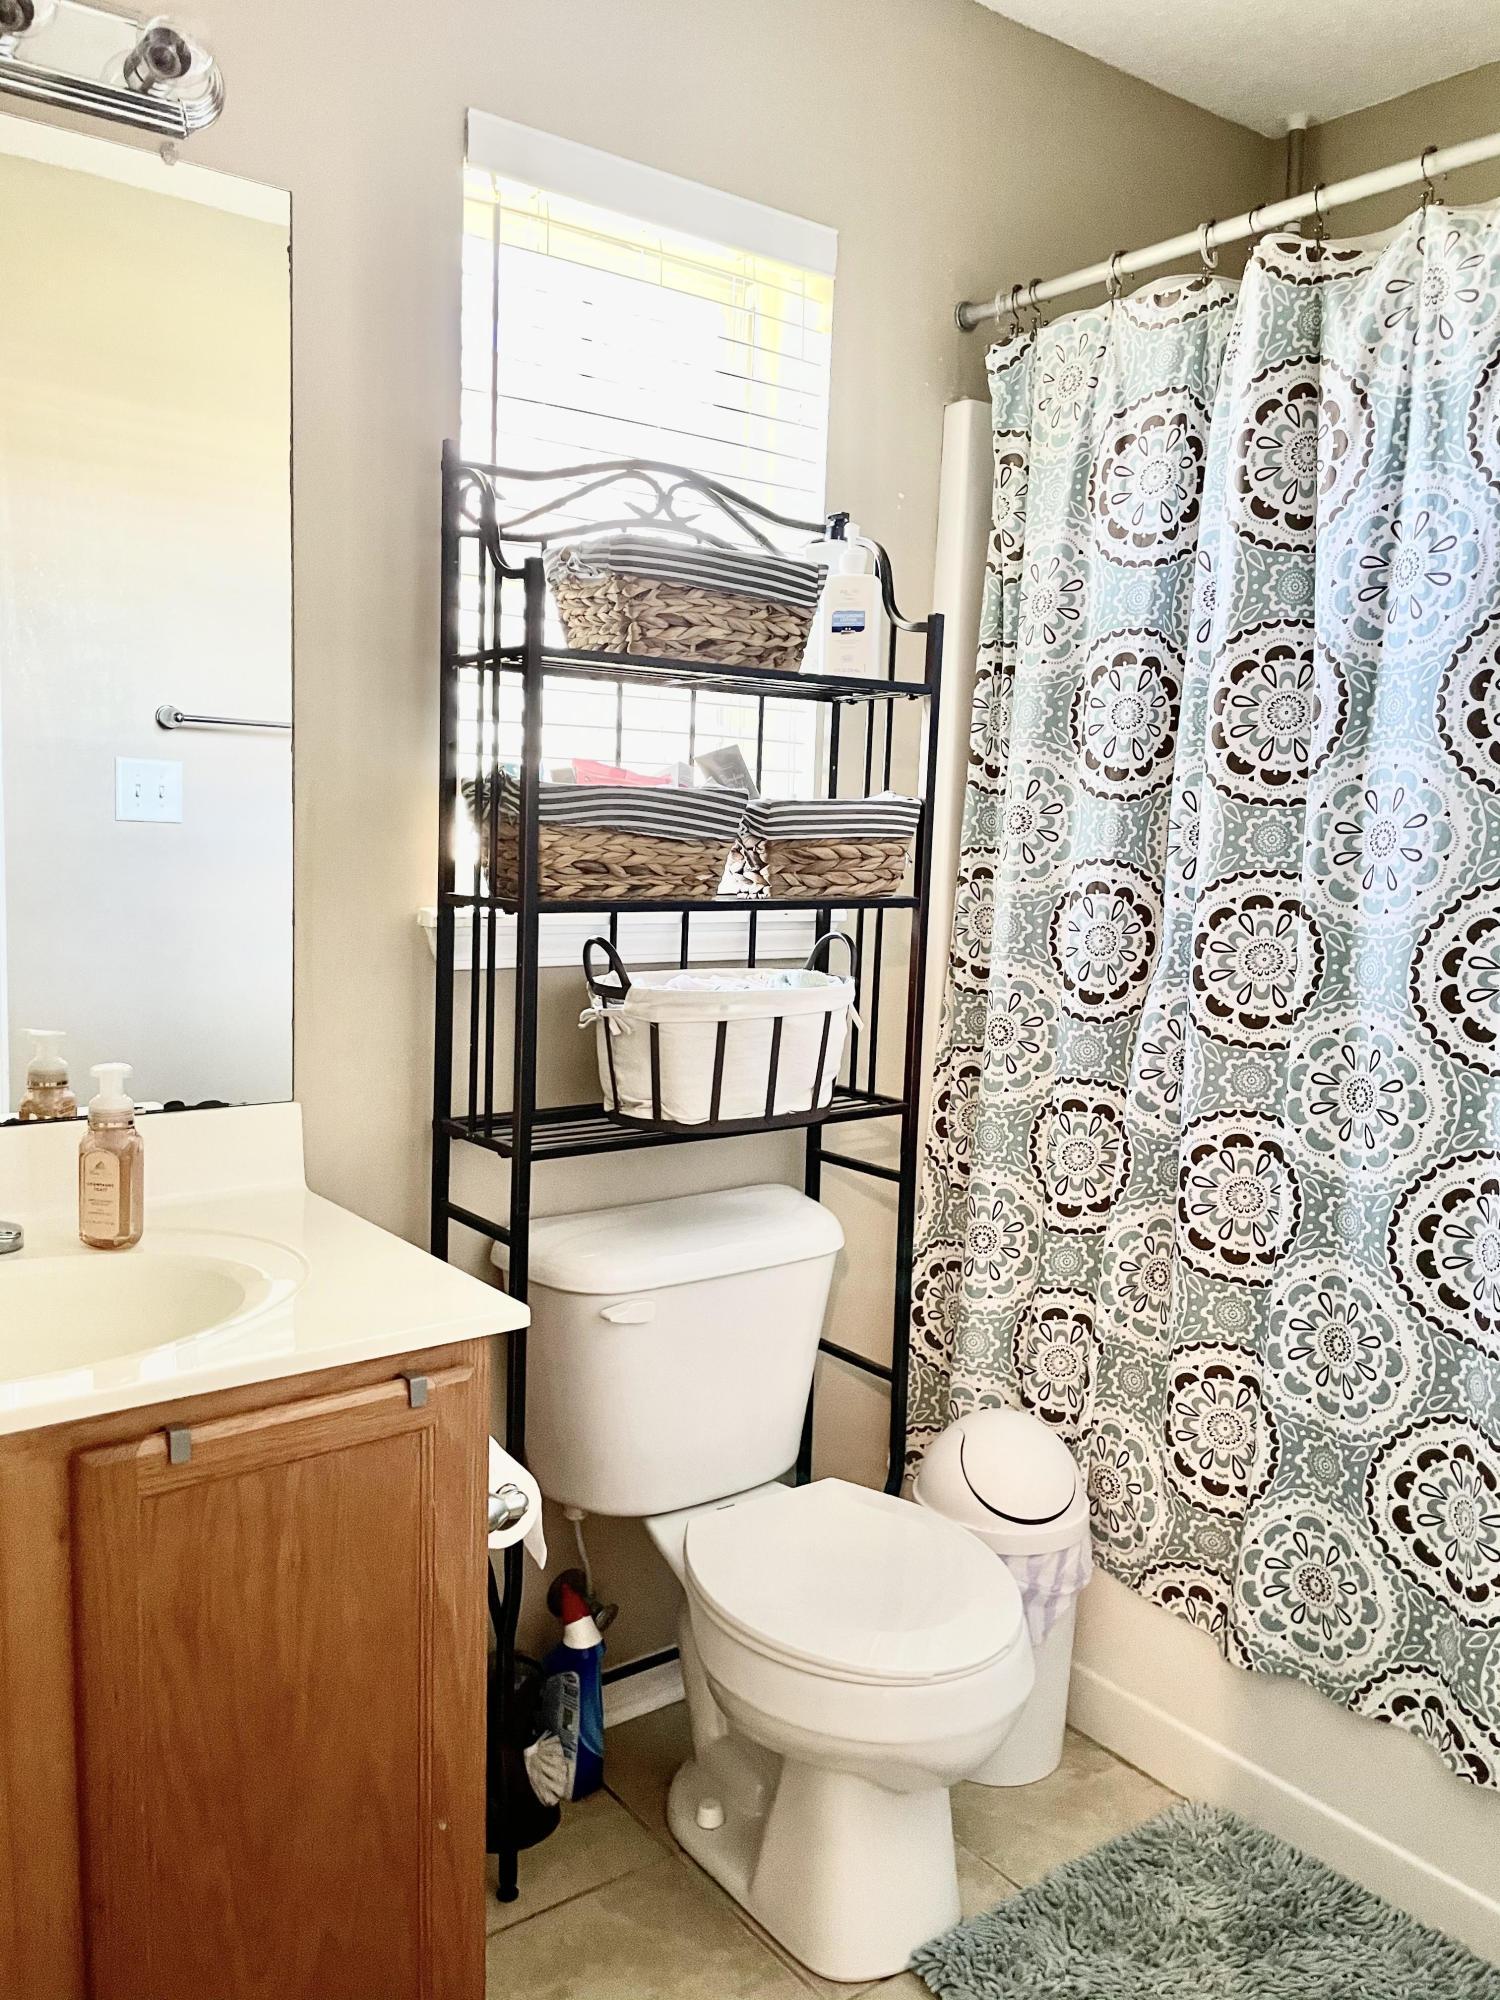 202 Snowden Court, Richlands, North Carolina 28574, 3 Bedrooms Bedrooms, 5 Rooms Rooms,2 BathroomsBathrooms,Single family residence,For sale,Snowden,100264537